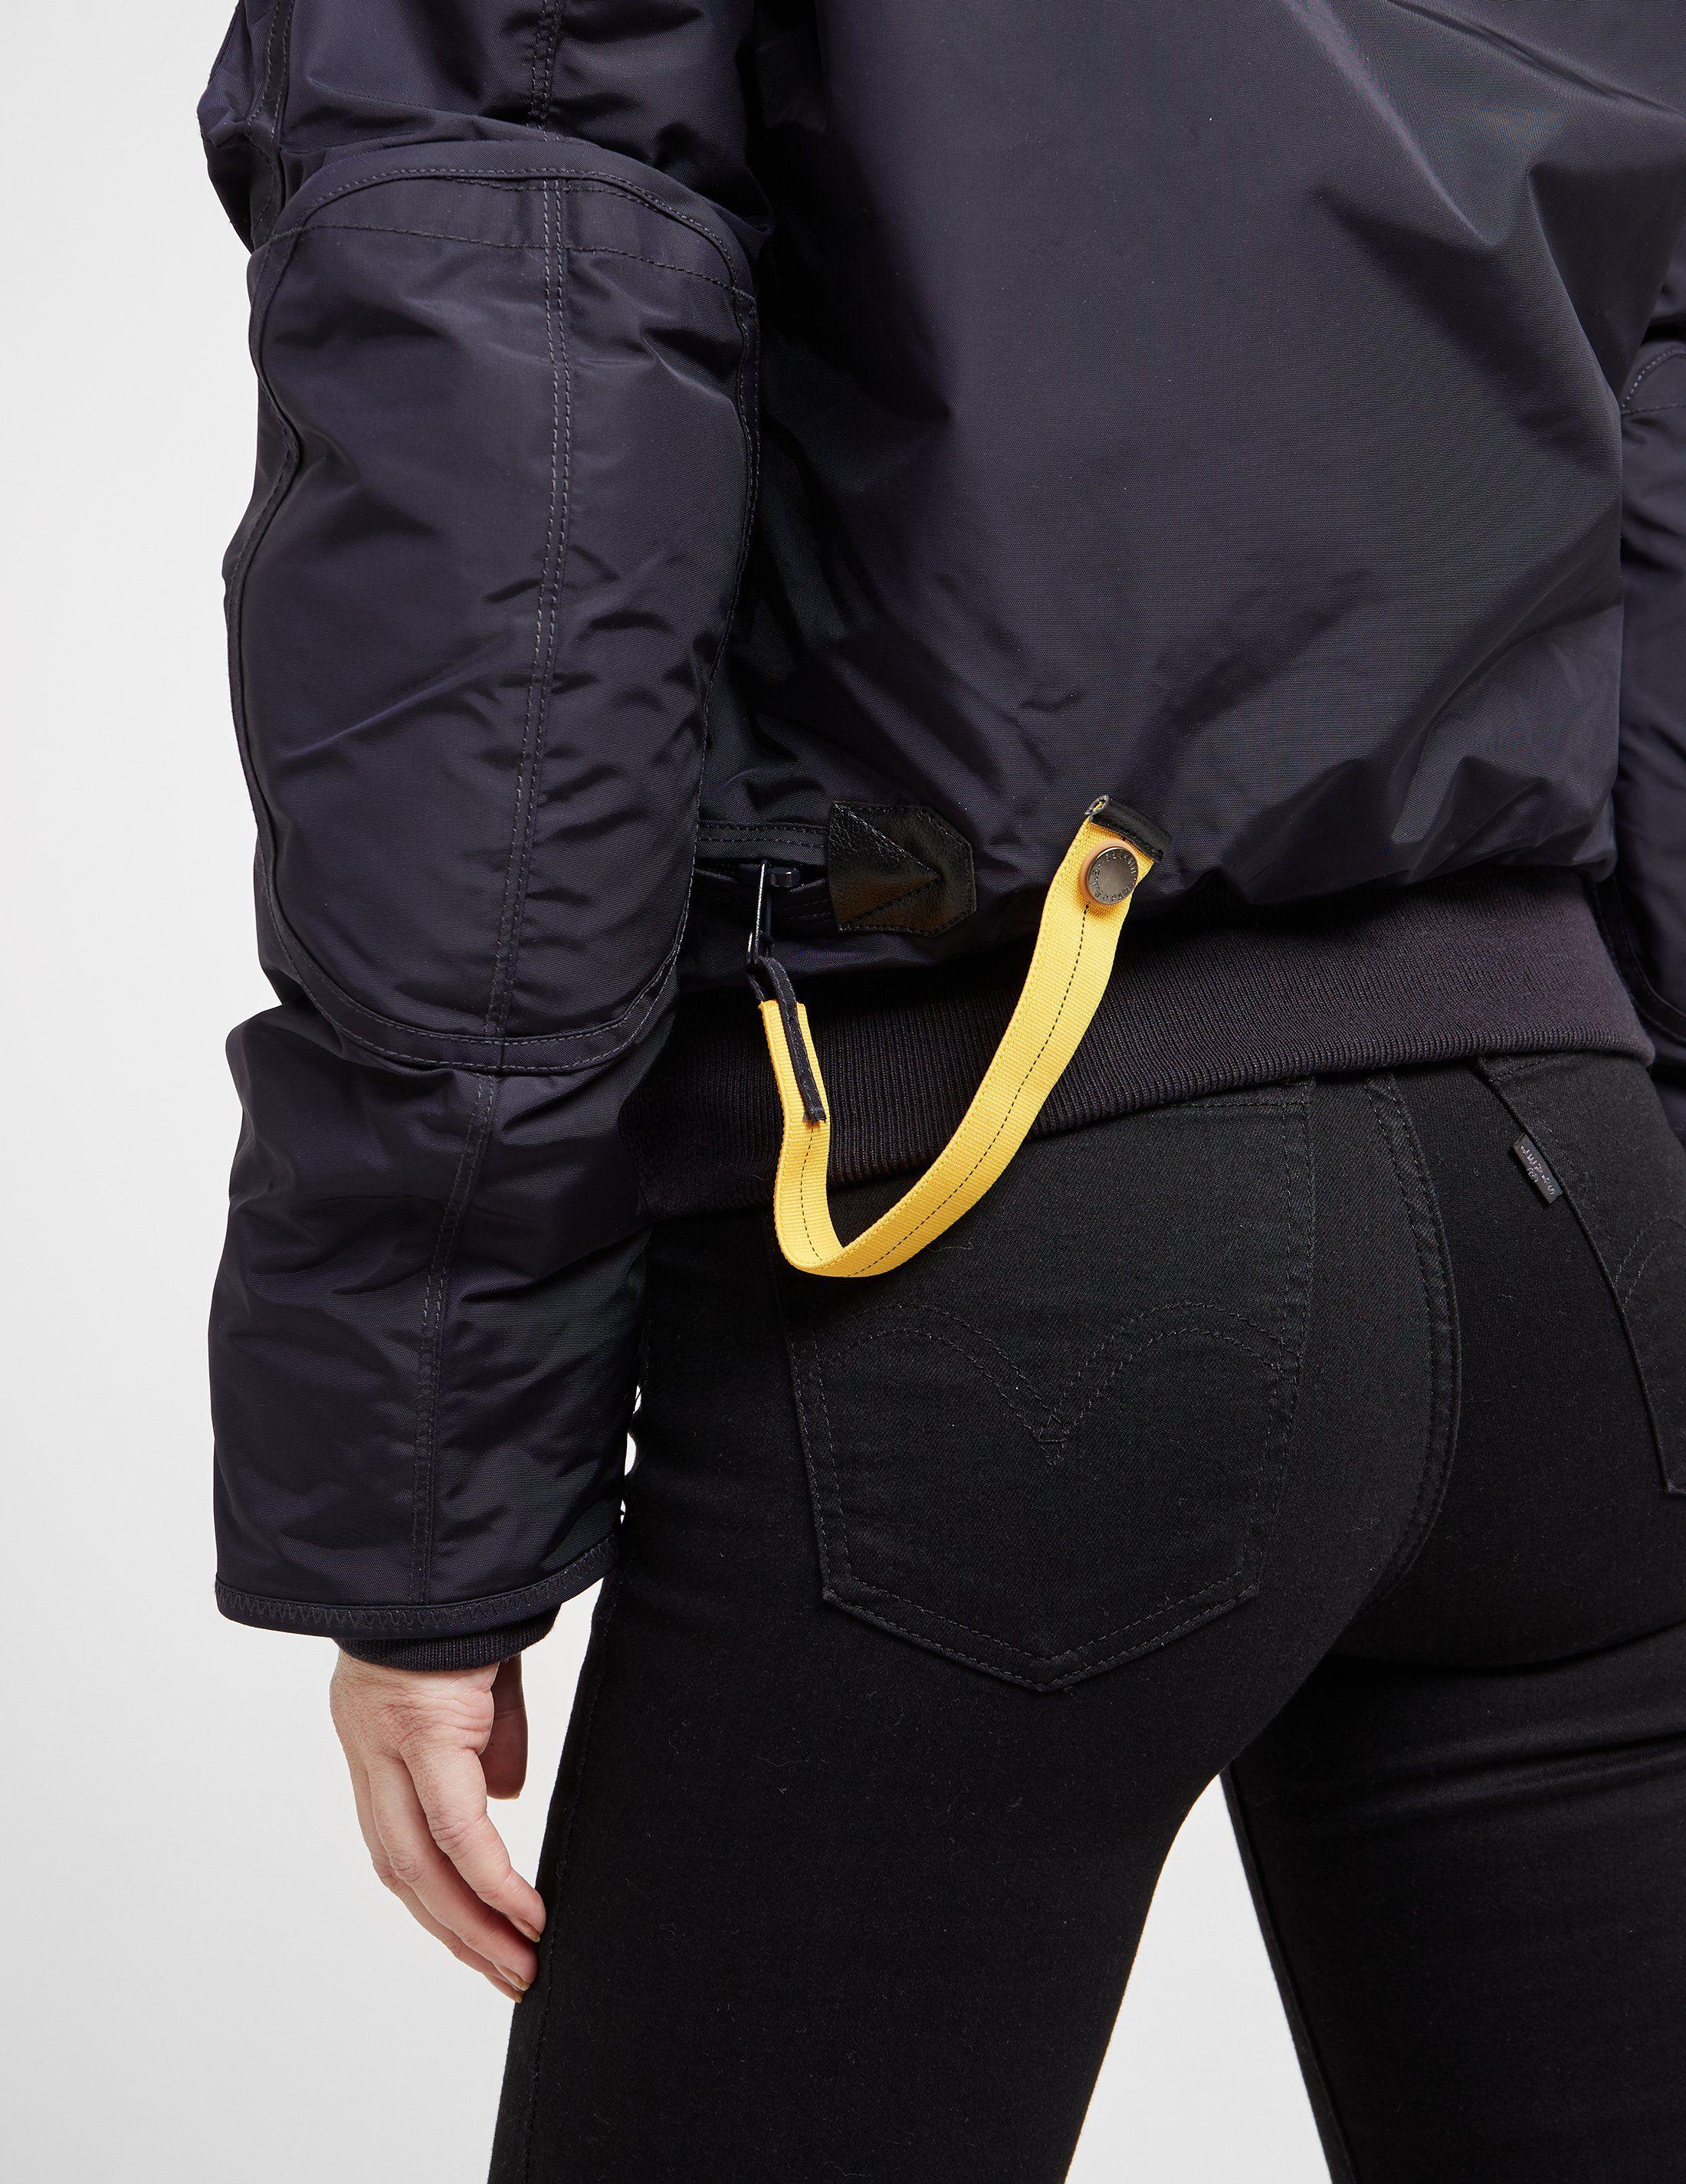 Parajumpers Gobi Short Padded Jacket